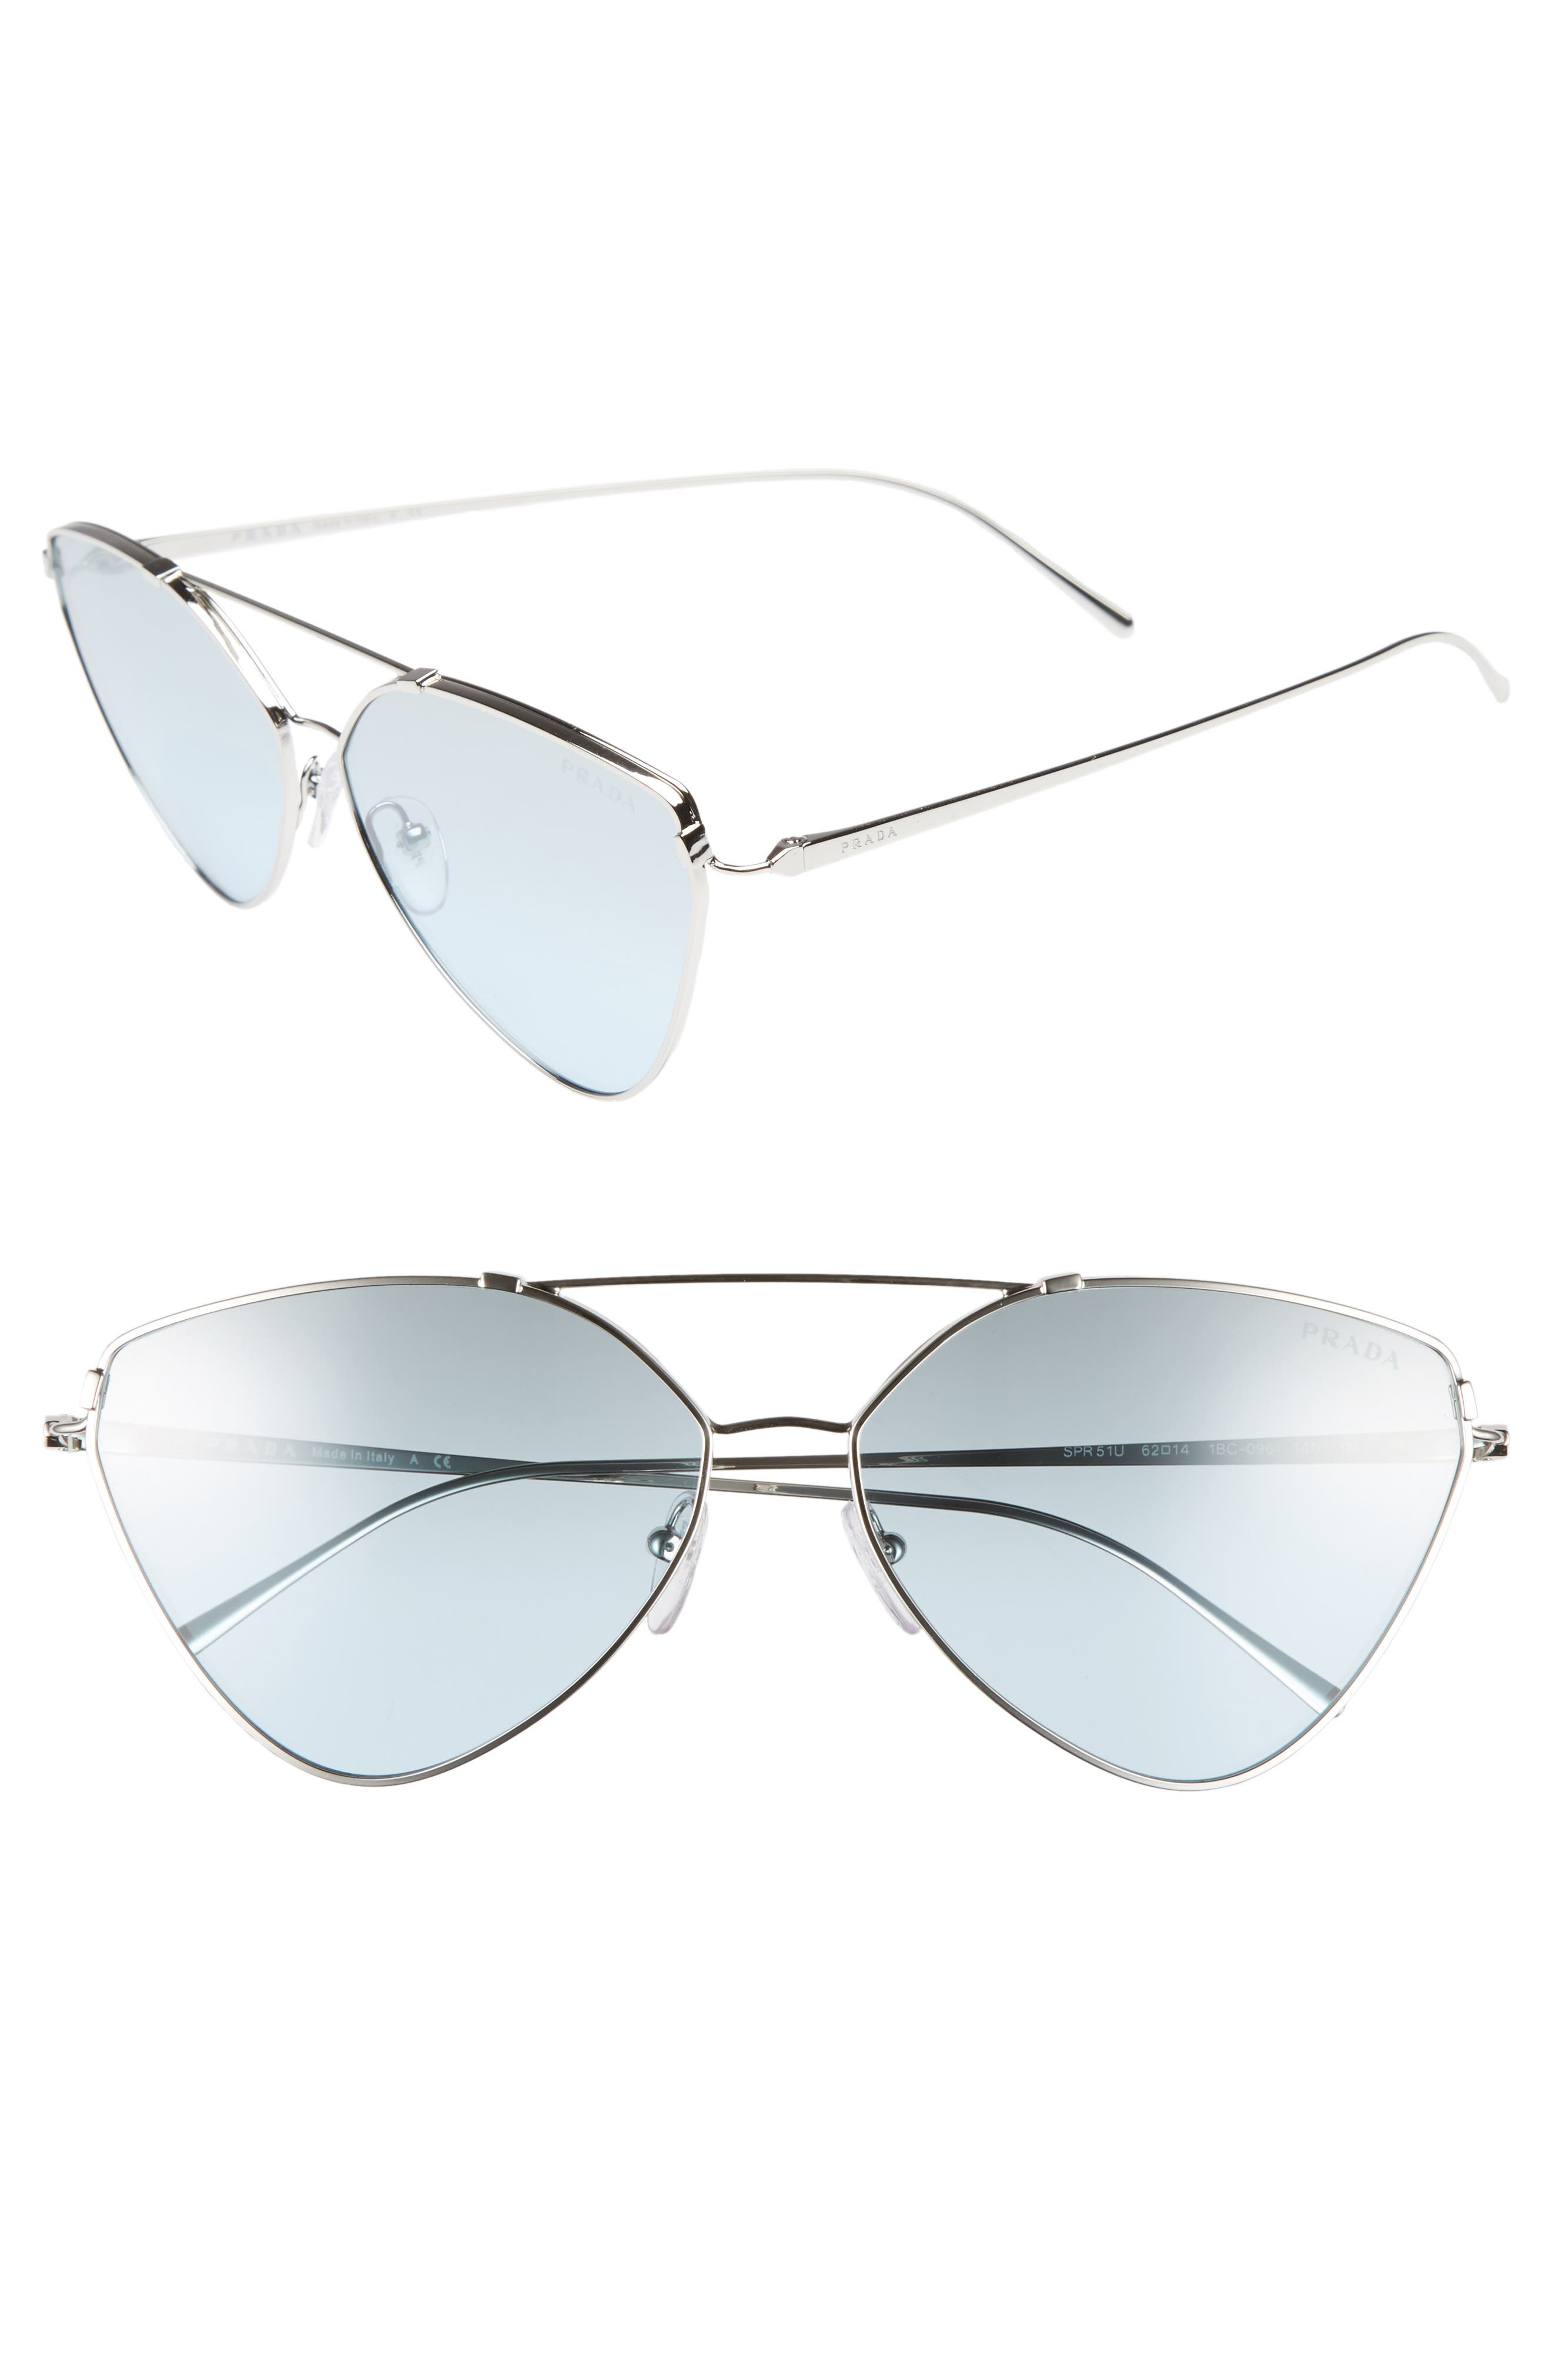 62mm Oversize Aviator Sunglasses,                             Main thumbnail 1, color,